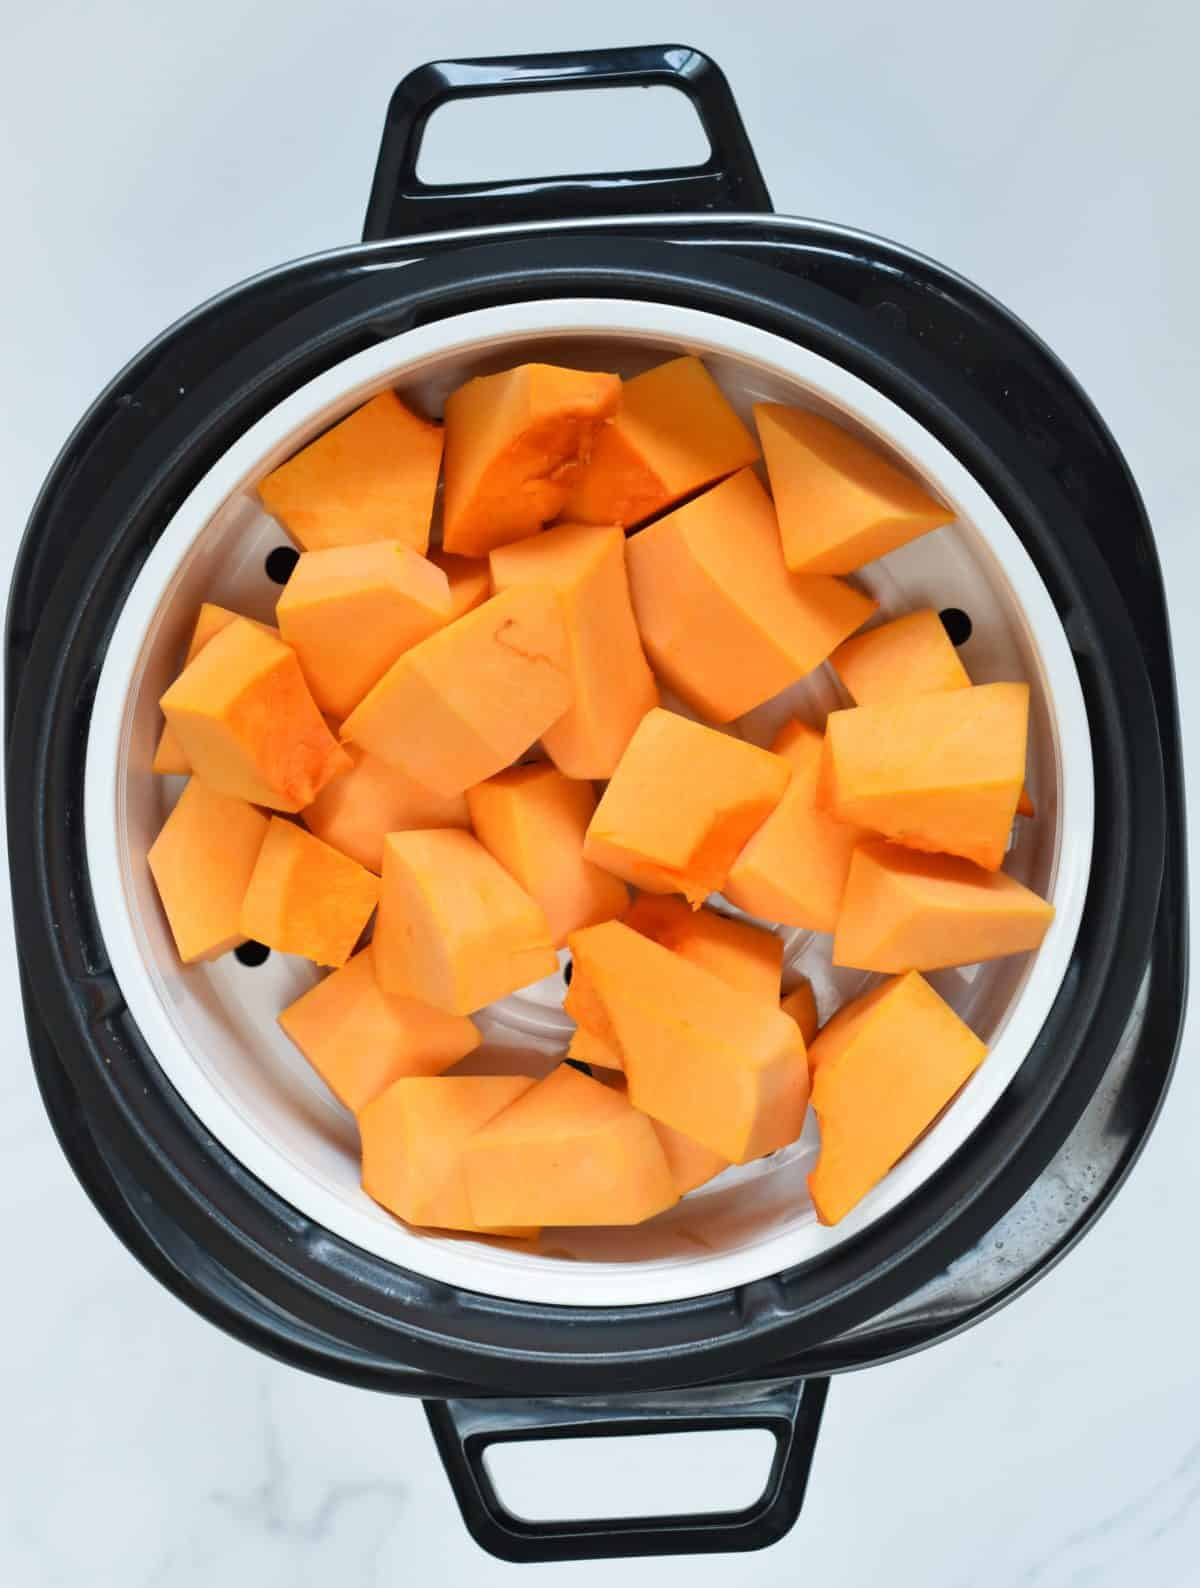 How to steam pumpkin